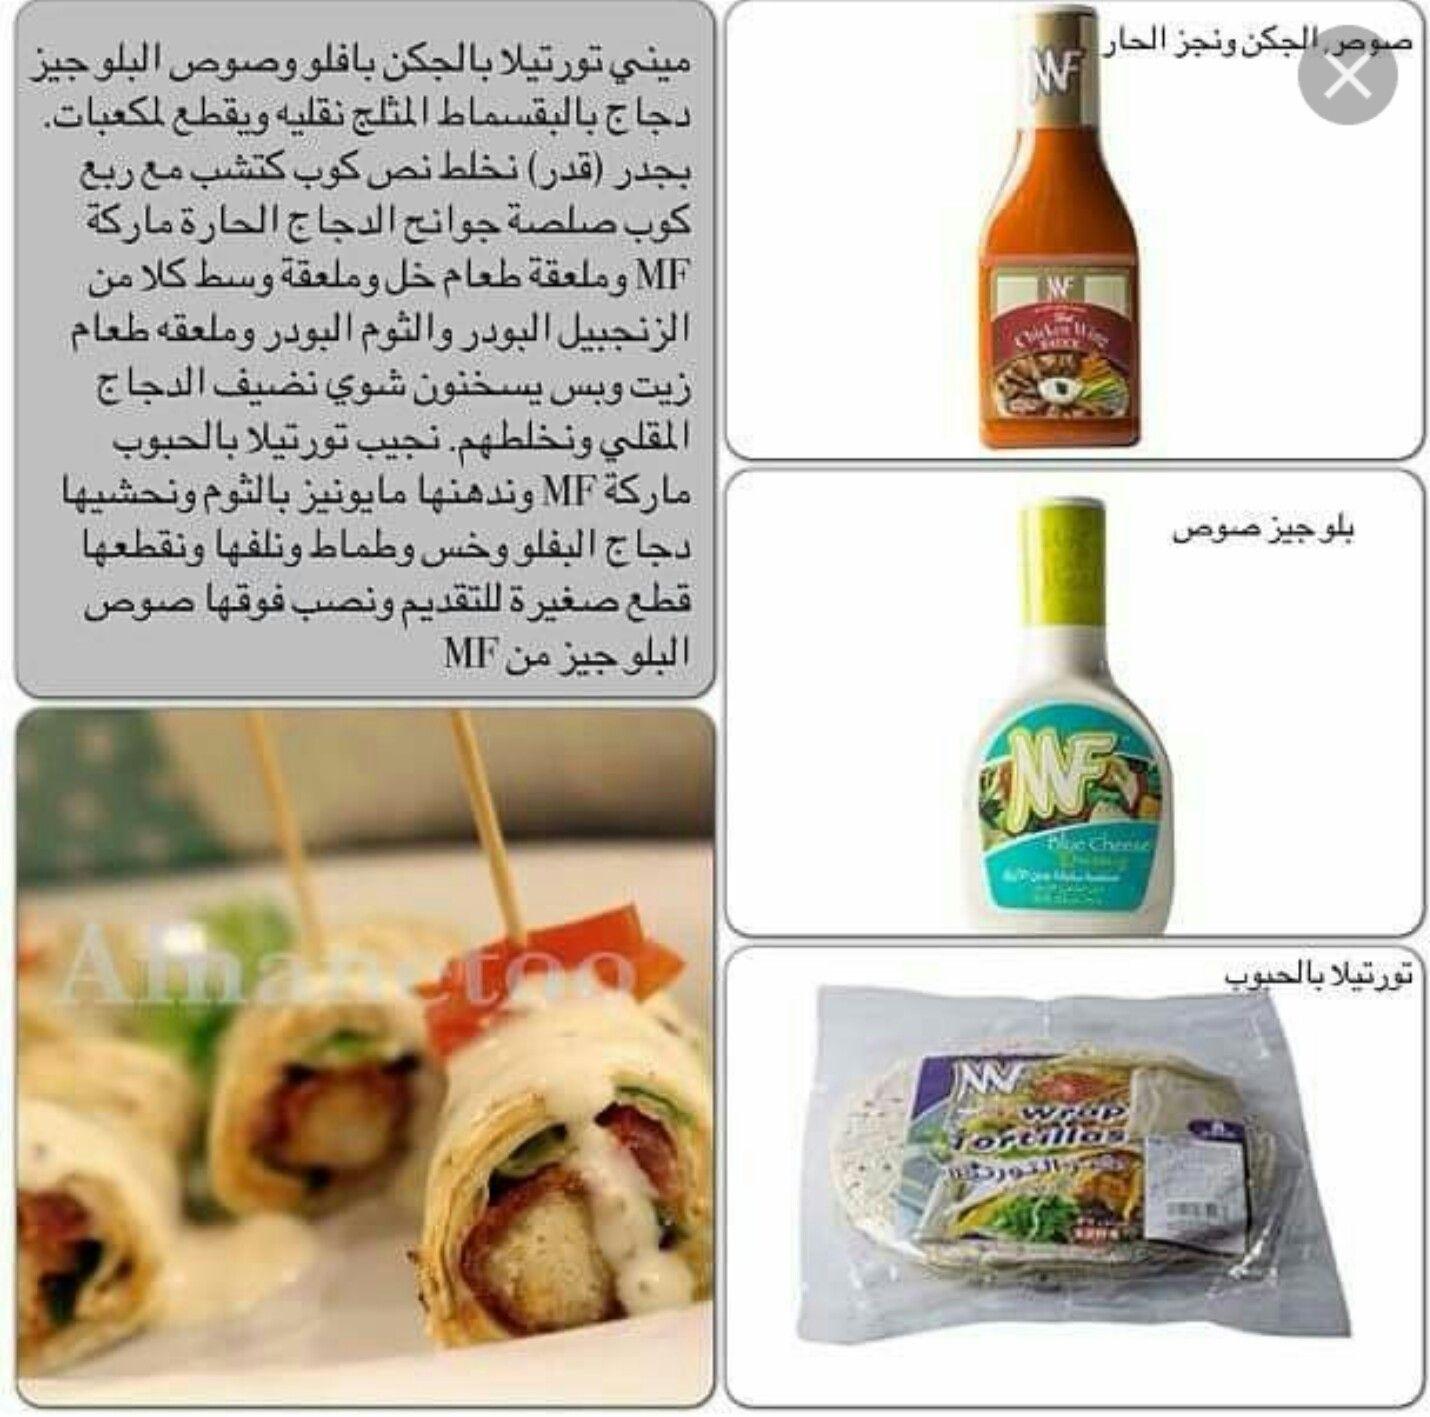 Pin By Asma On طبخات Food Food And Drink Cooking